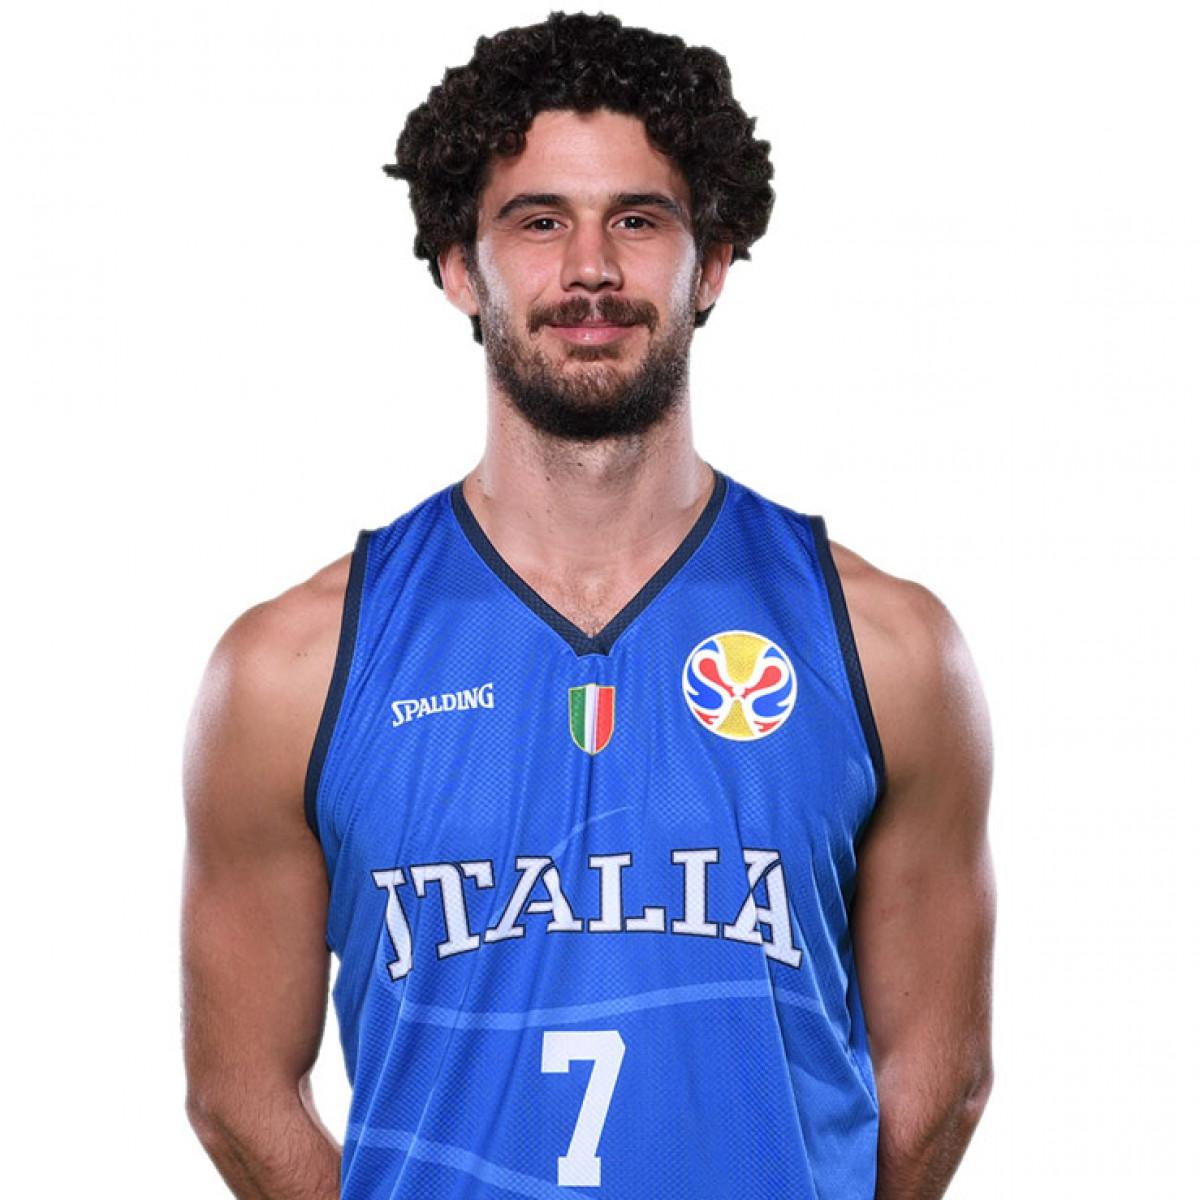 Photo of Luca Vitali, 2019-2020 season